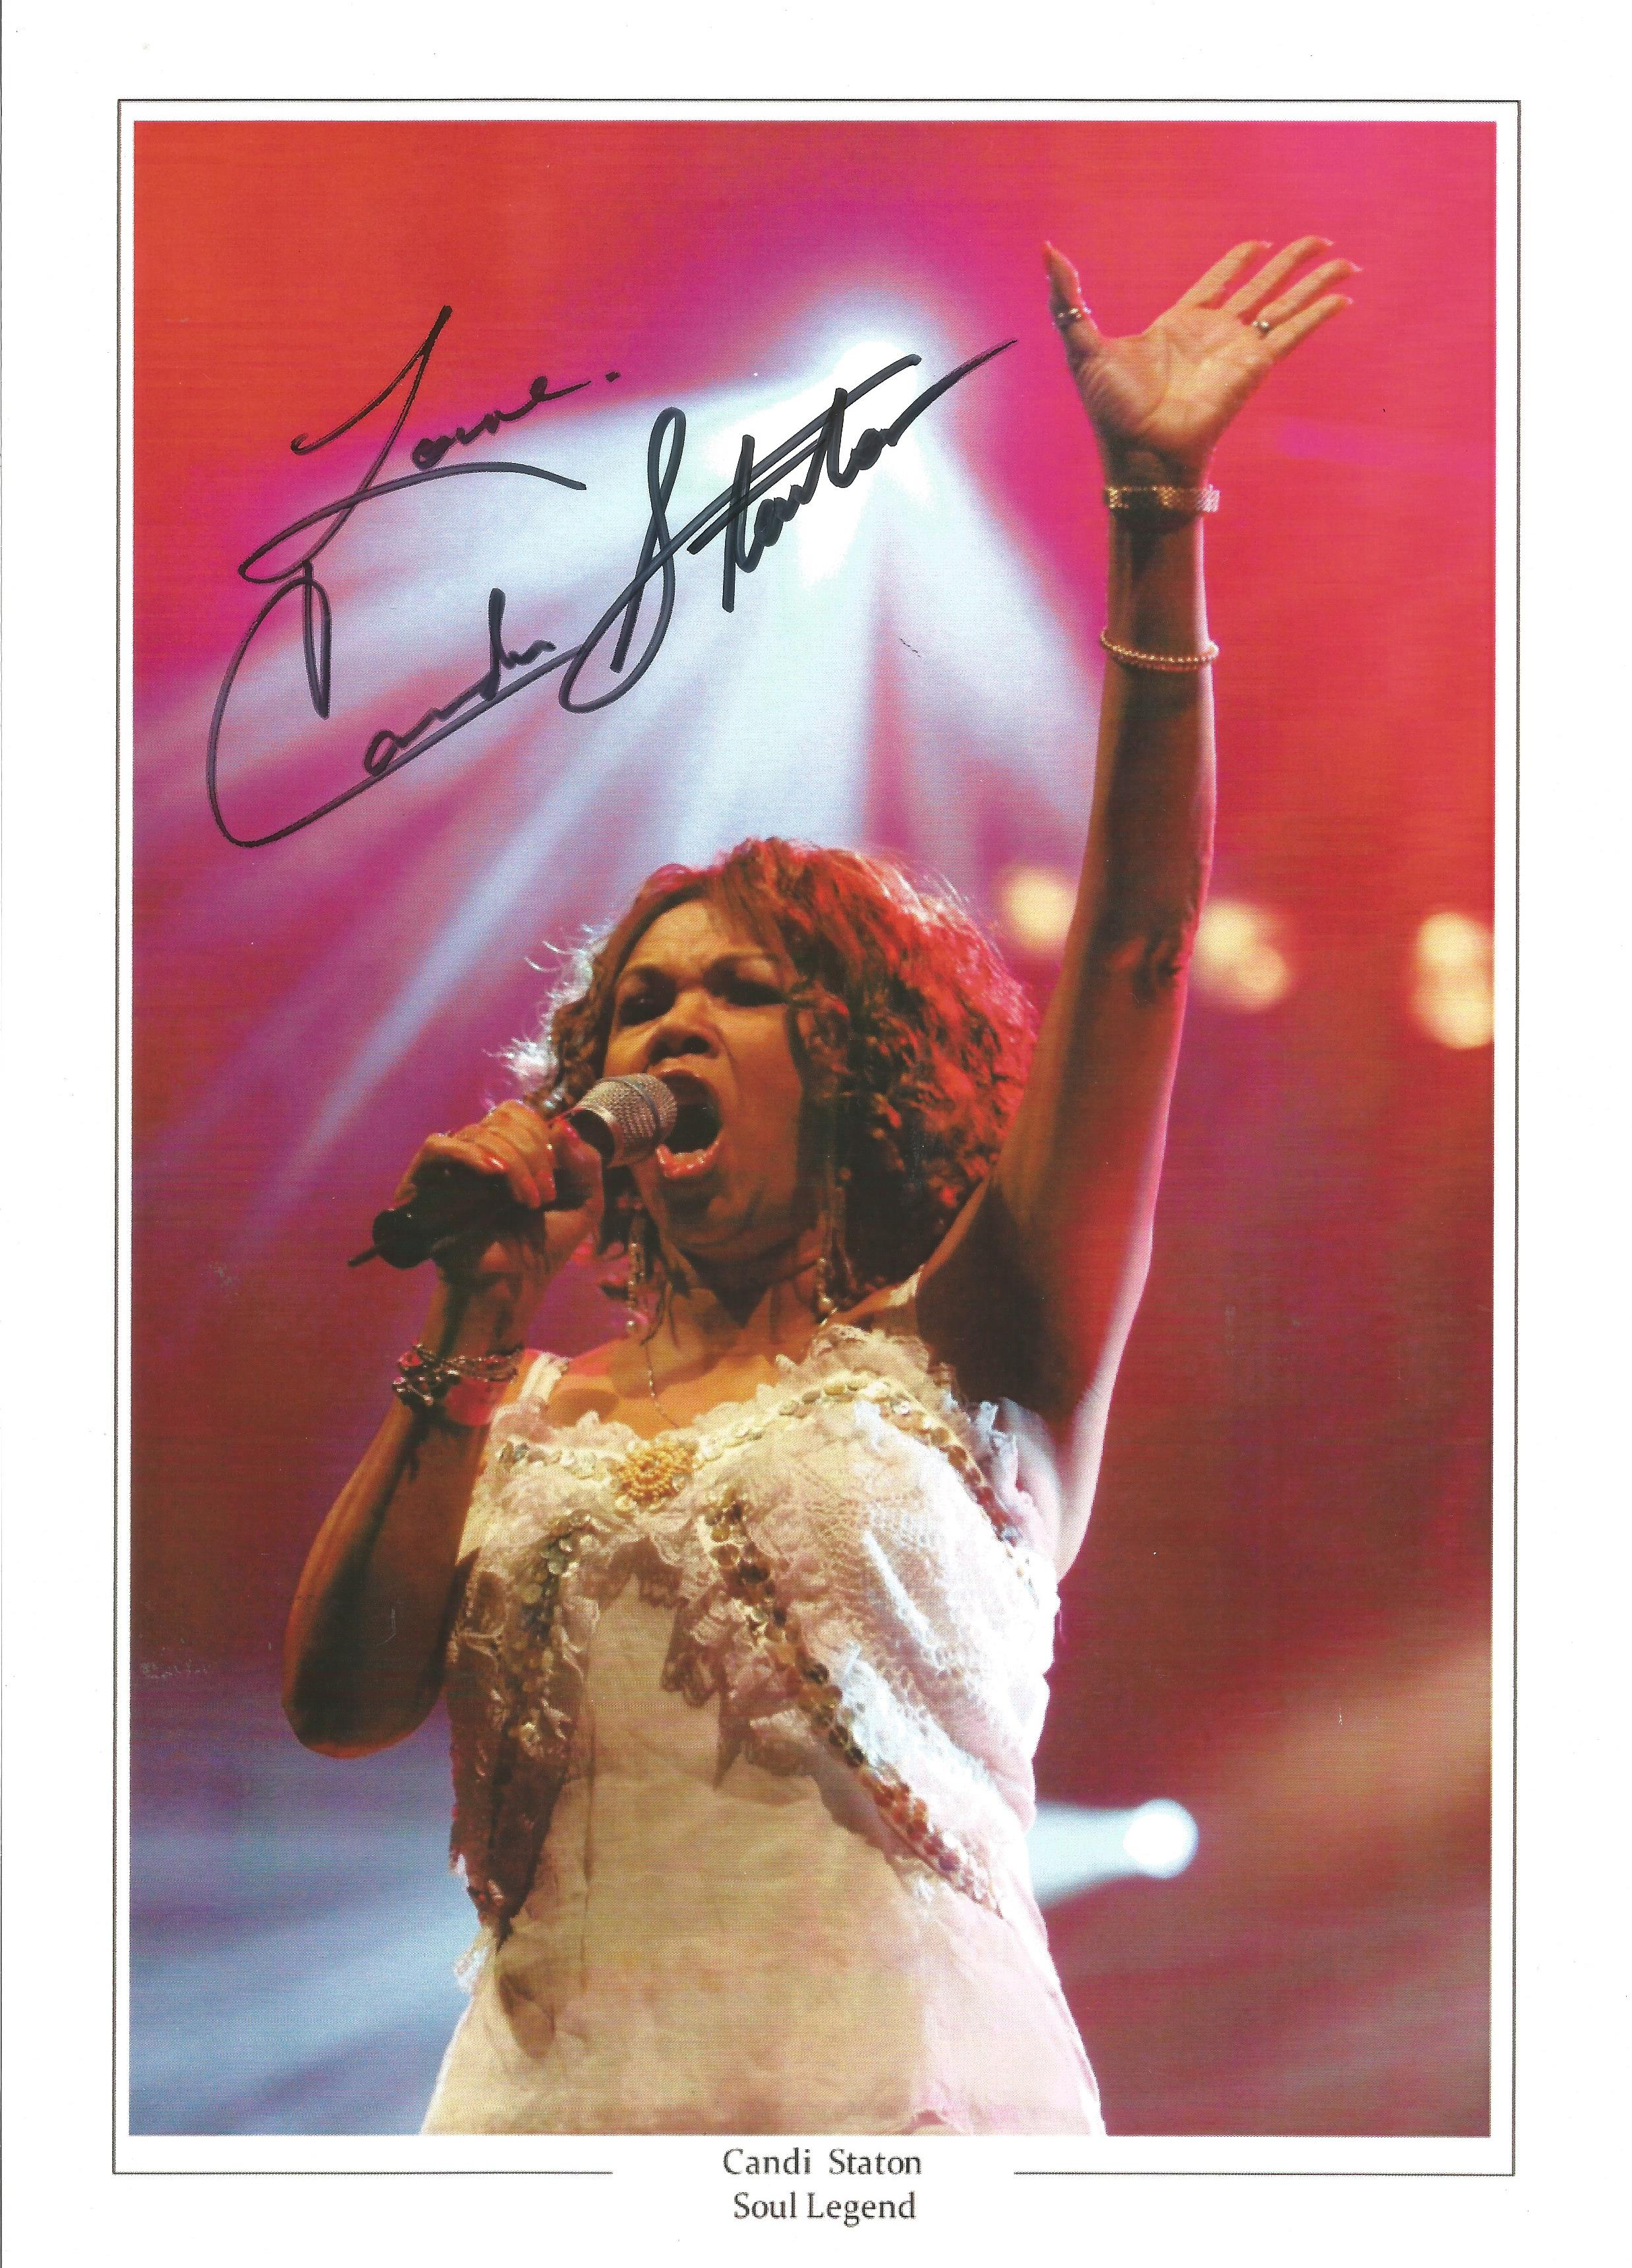 Candi Staton Soul Legend signed 12x8 colour photo. Canzetta Maria Candi Staton born March 13,